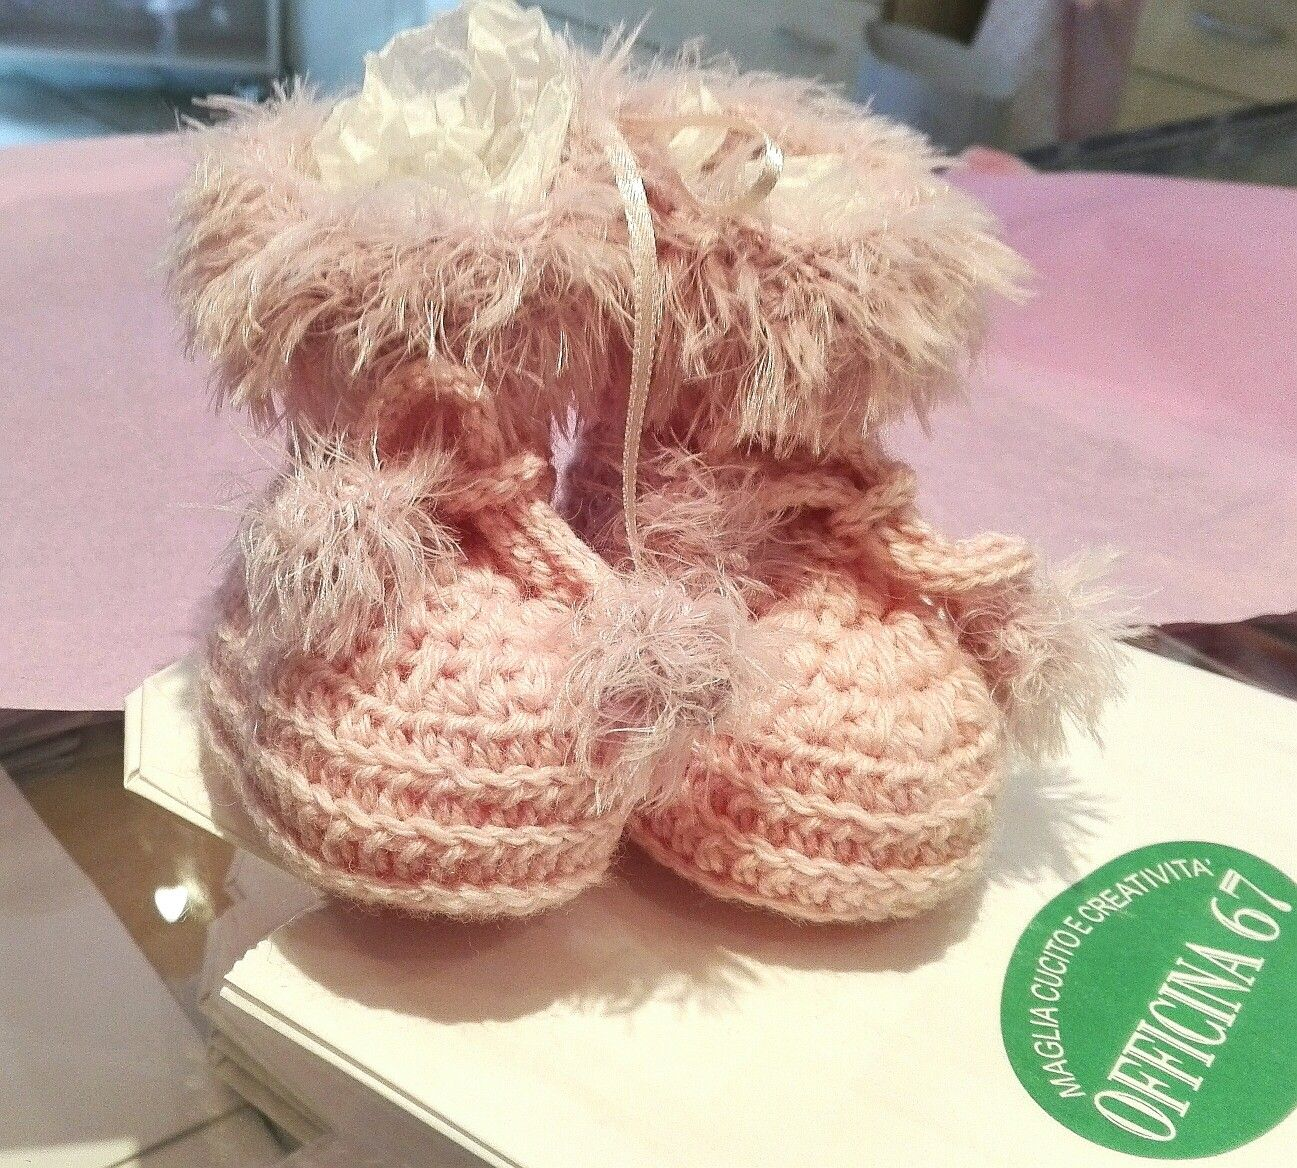 7066a03e5f Handmade baby shoes by Officina 67,via Nazionale 105 Naples ...